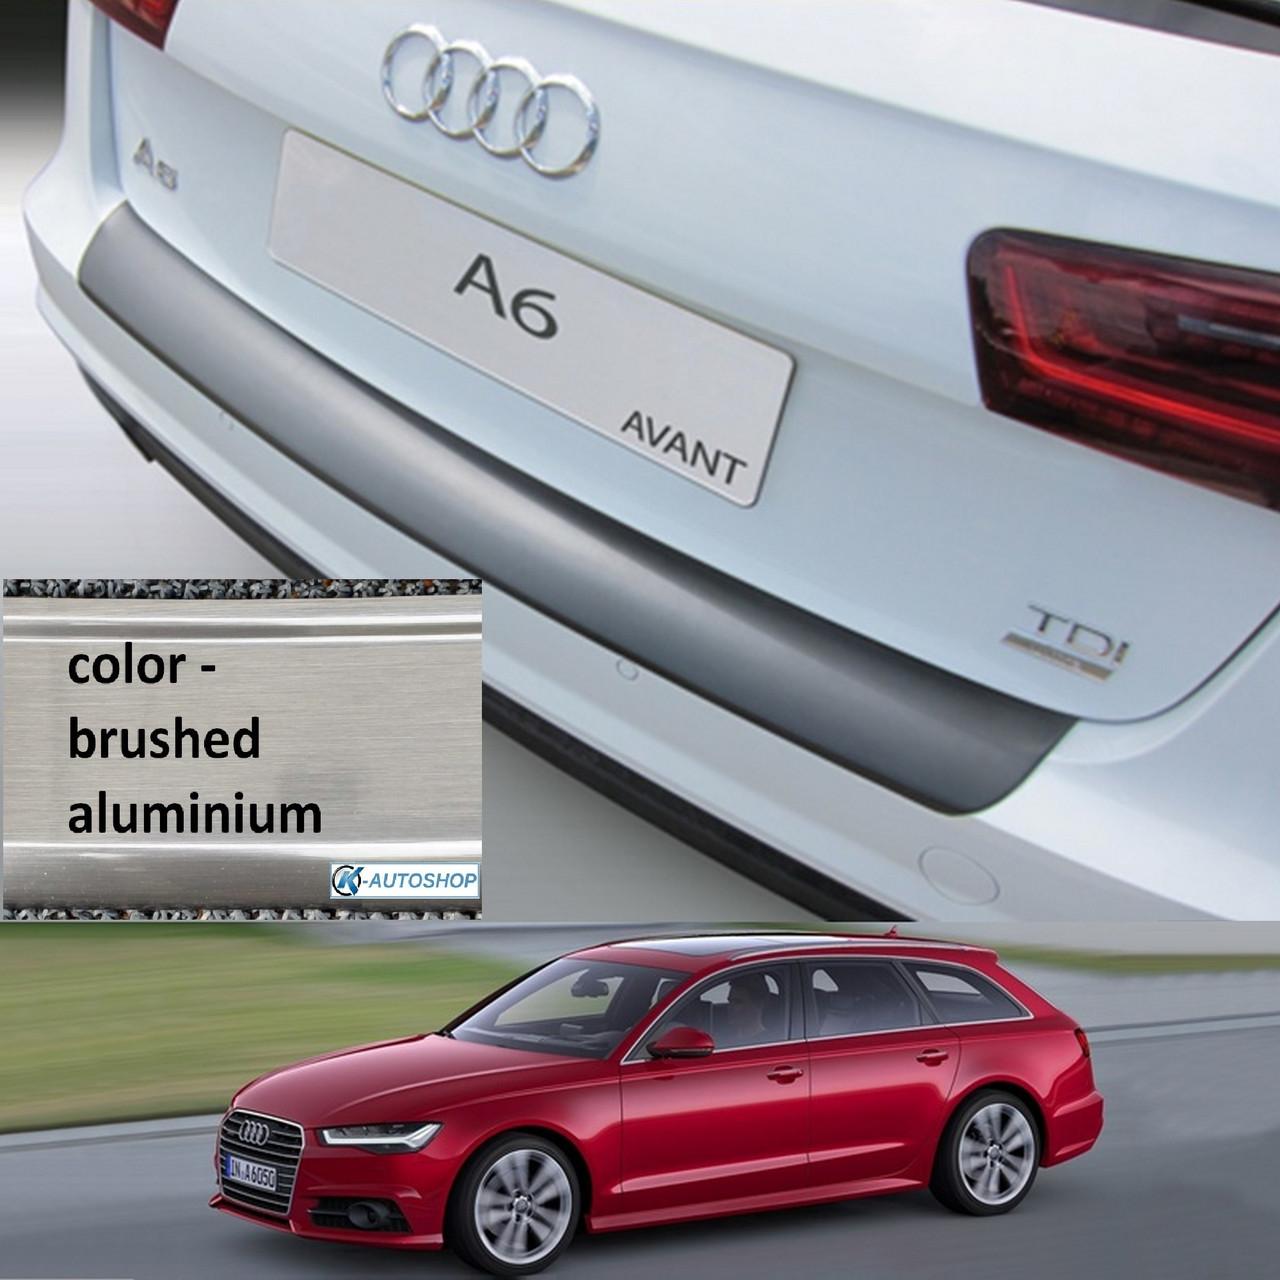 Пластиковая защитная накладка на задний бампер для Audi A6 Avant рестайл 09.2014-08.2018